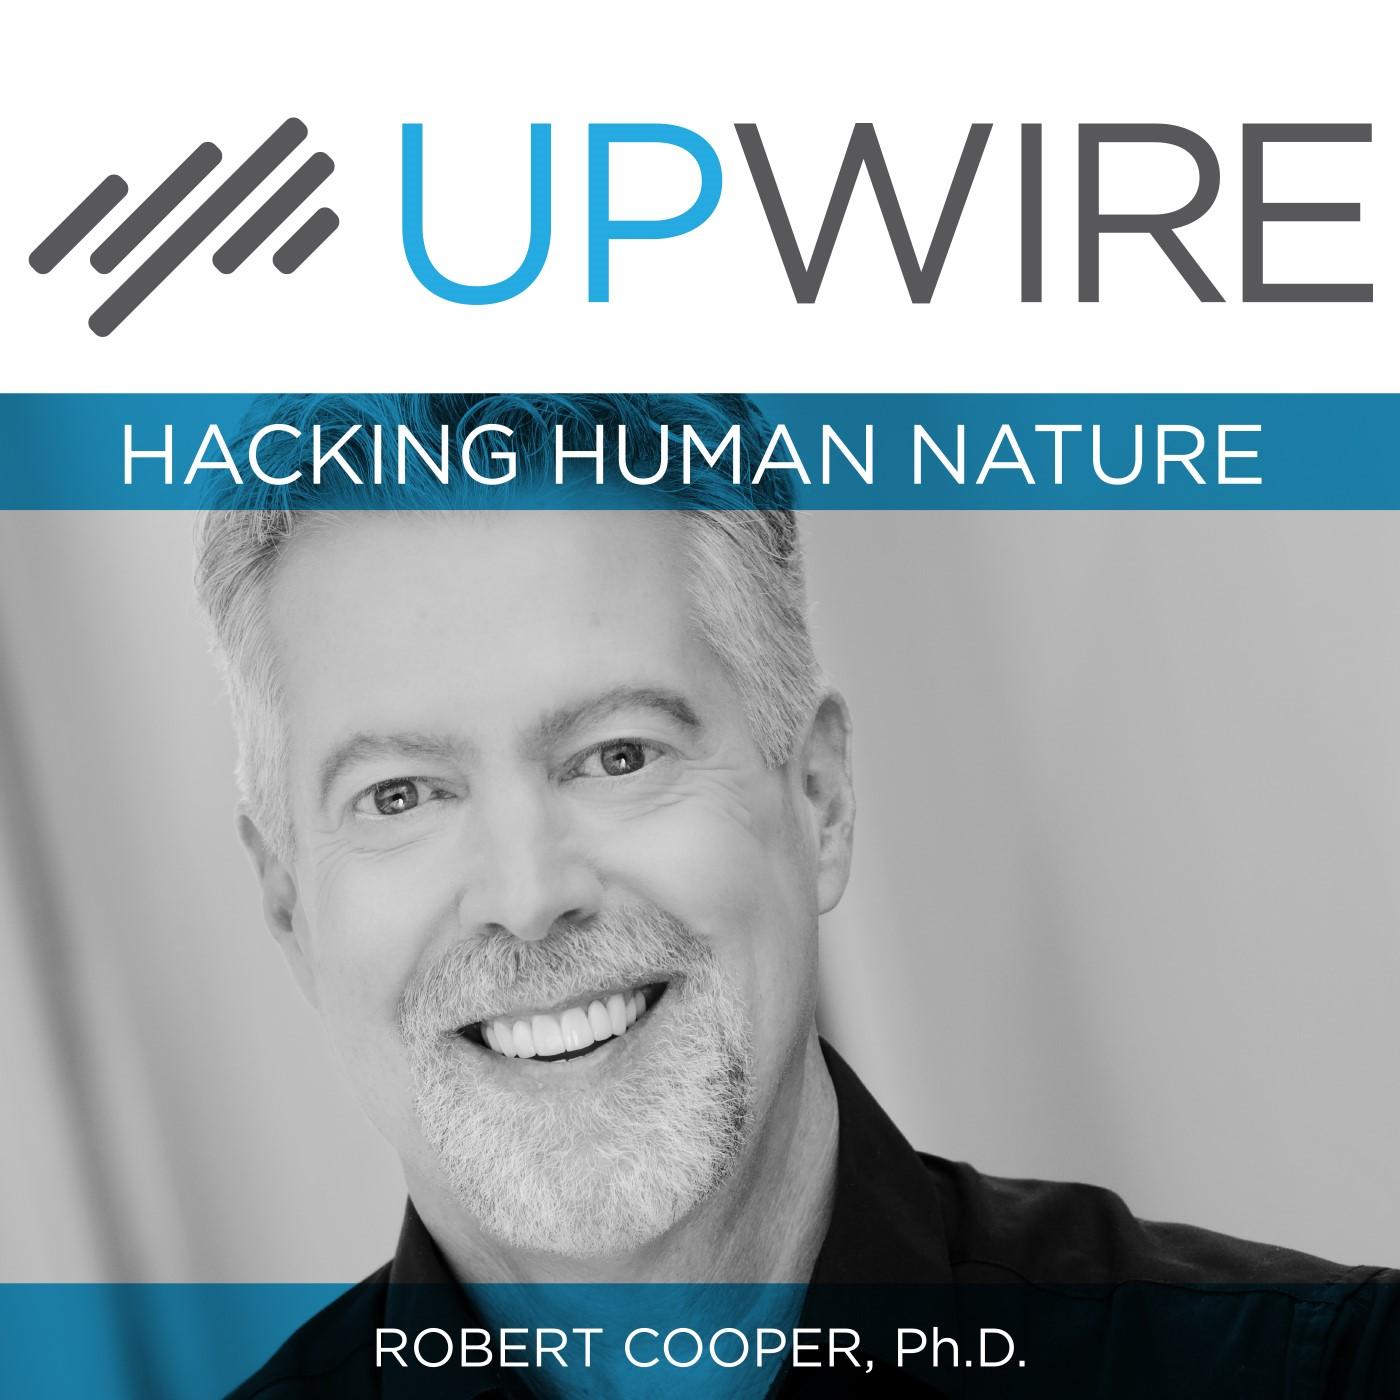 UPWIRE: Hacking Human Nature show art